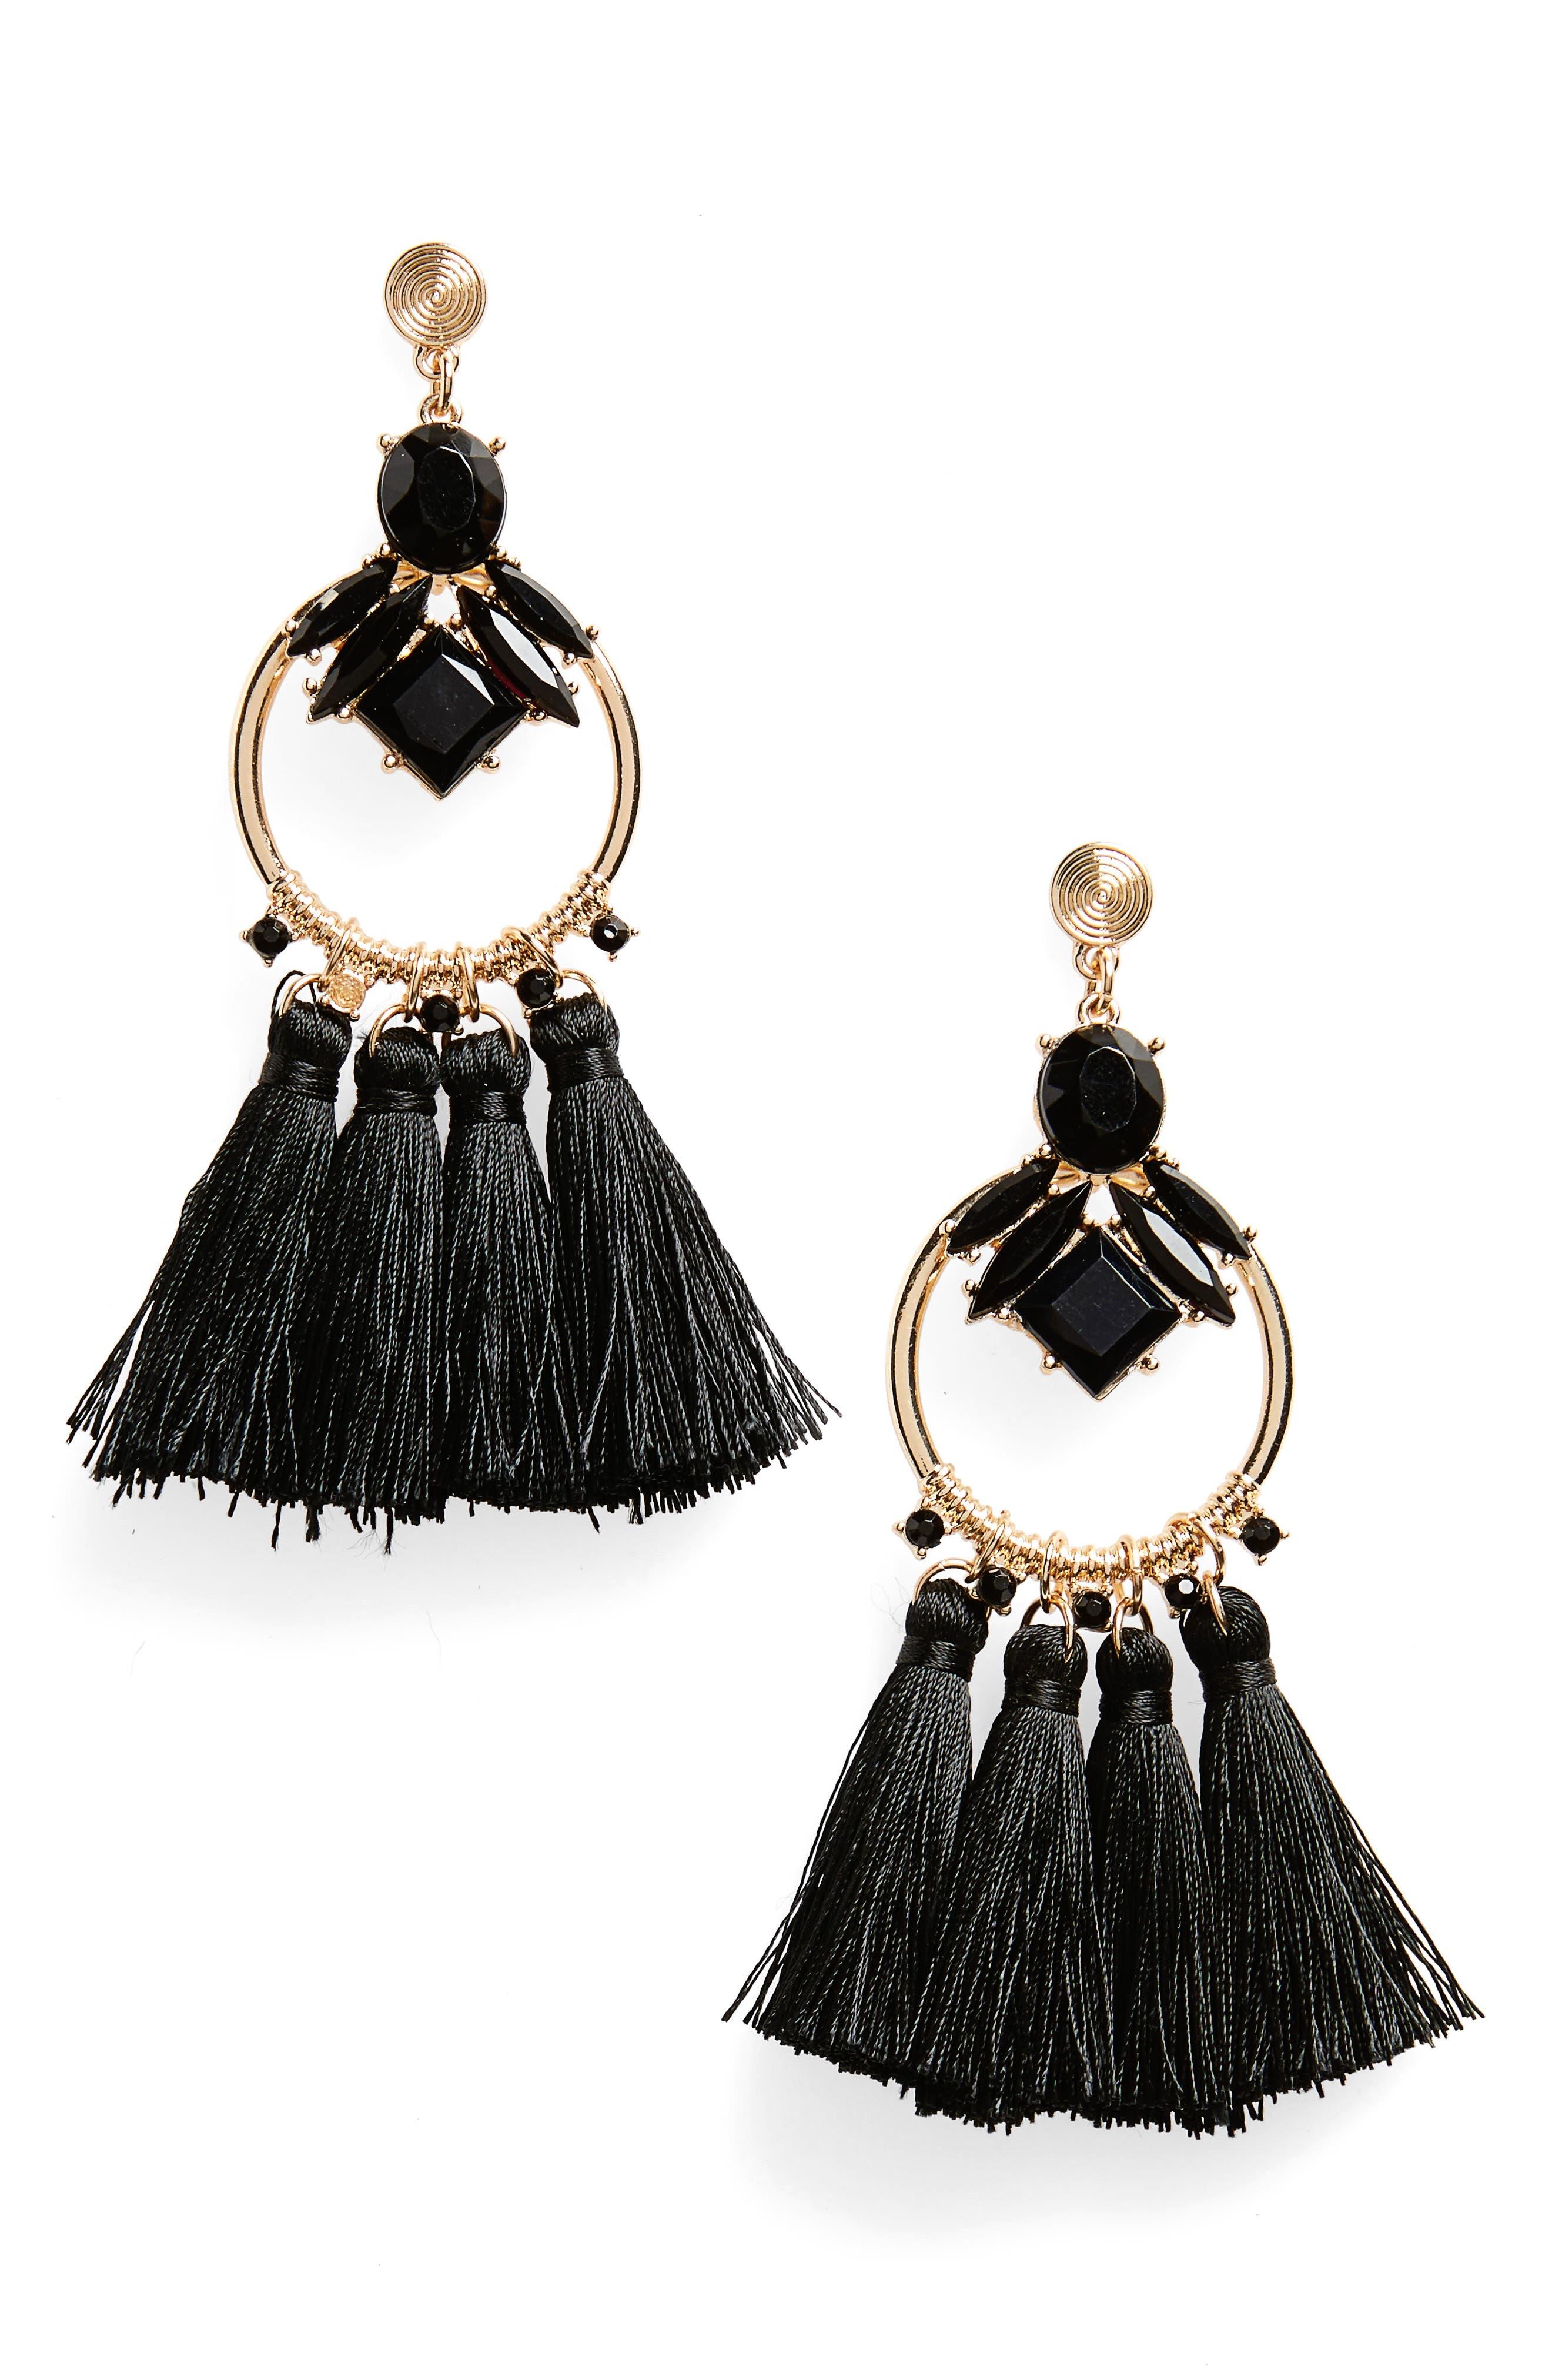 Crystal & Tassel Drop Earrings,                             Main thumbnail 1, color,                             Gold/ Black